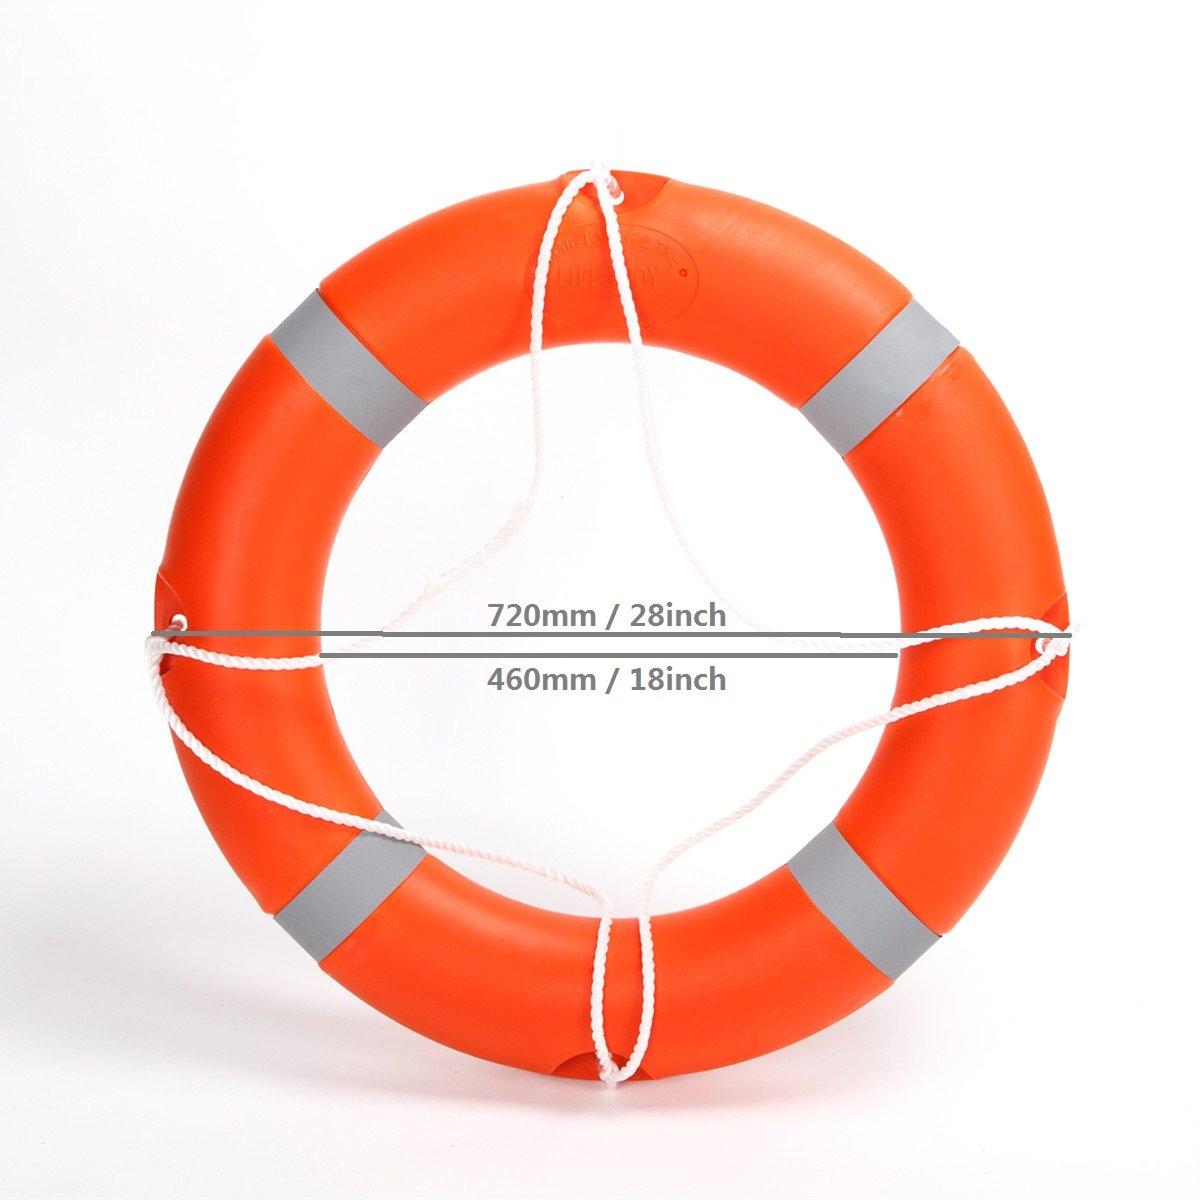 BeautySu. 28'' Diameter Professional Adult Foam Swim Ring Buoy Orange Lifering with White Bands by BeautySu. (Image #2)